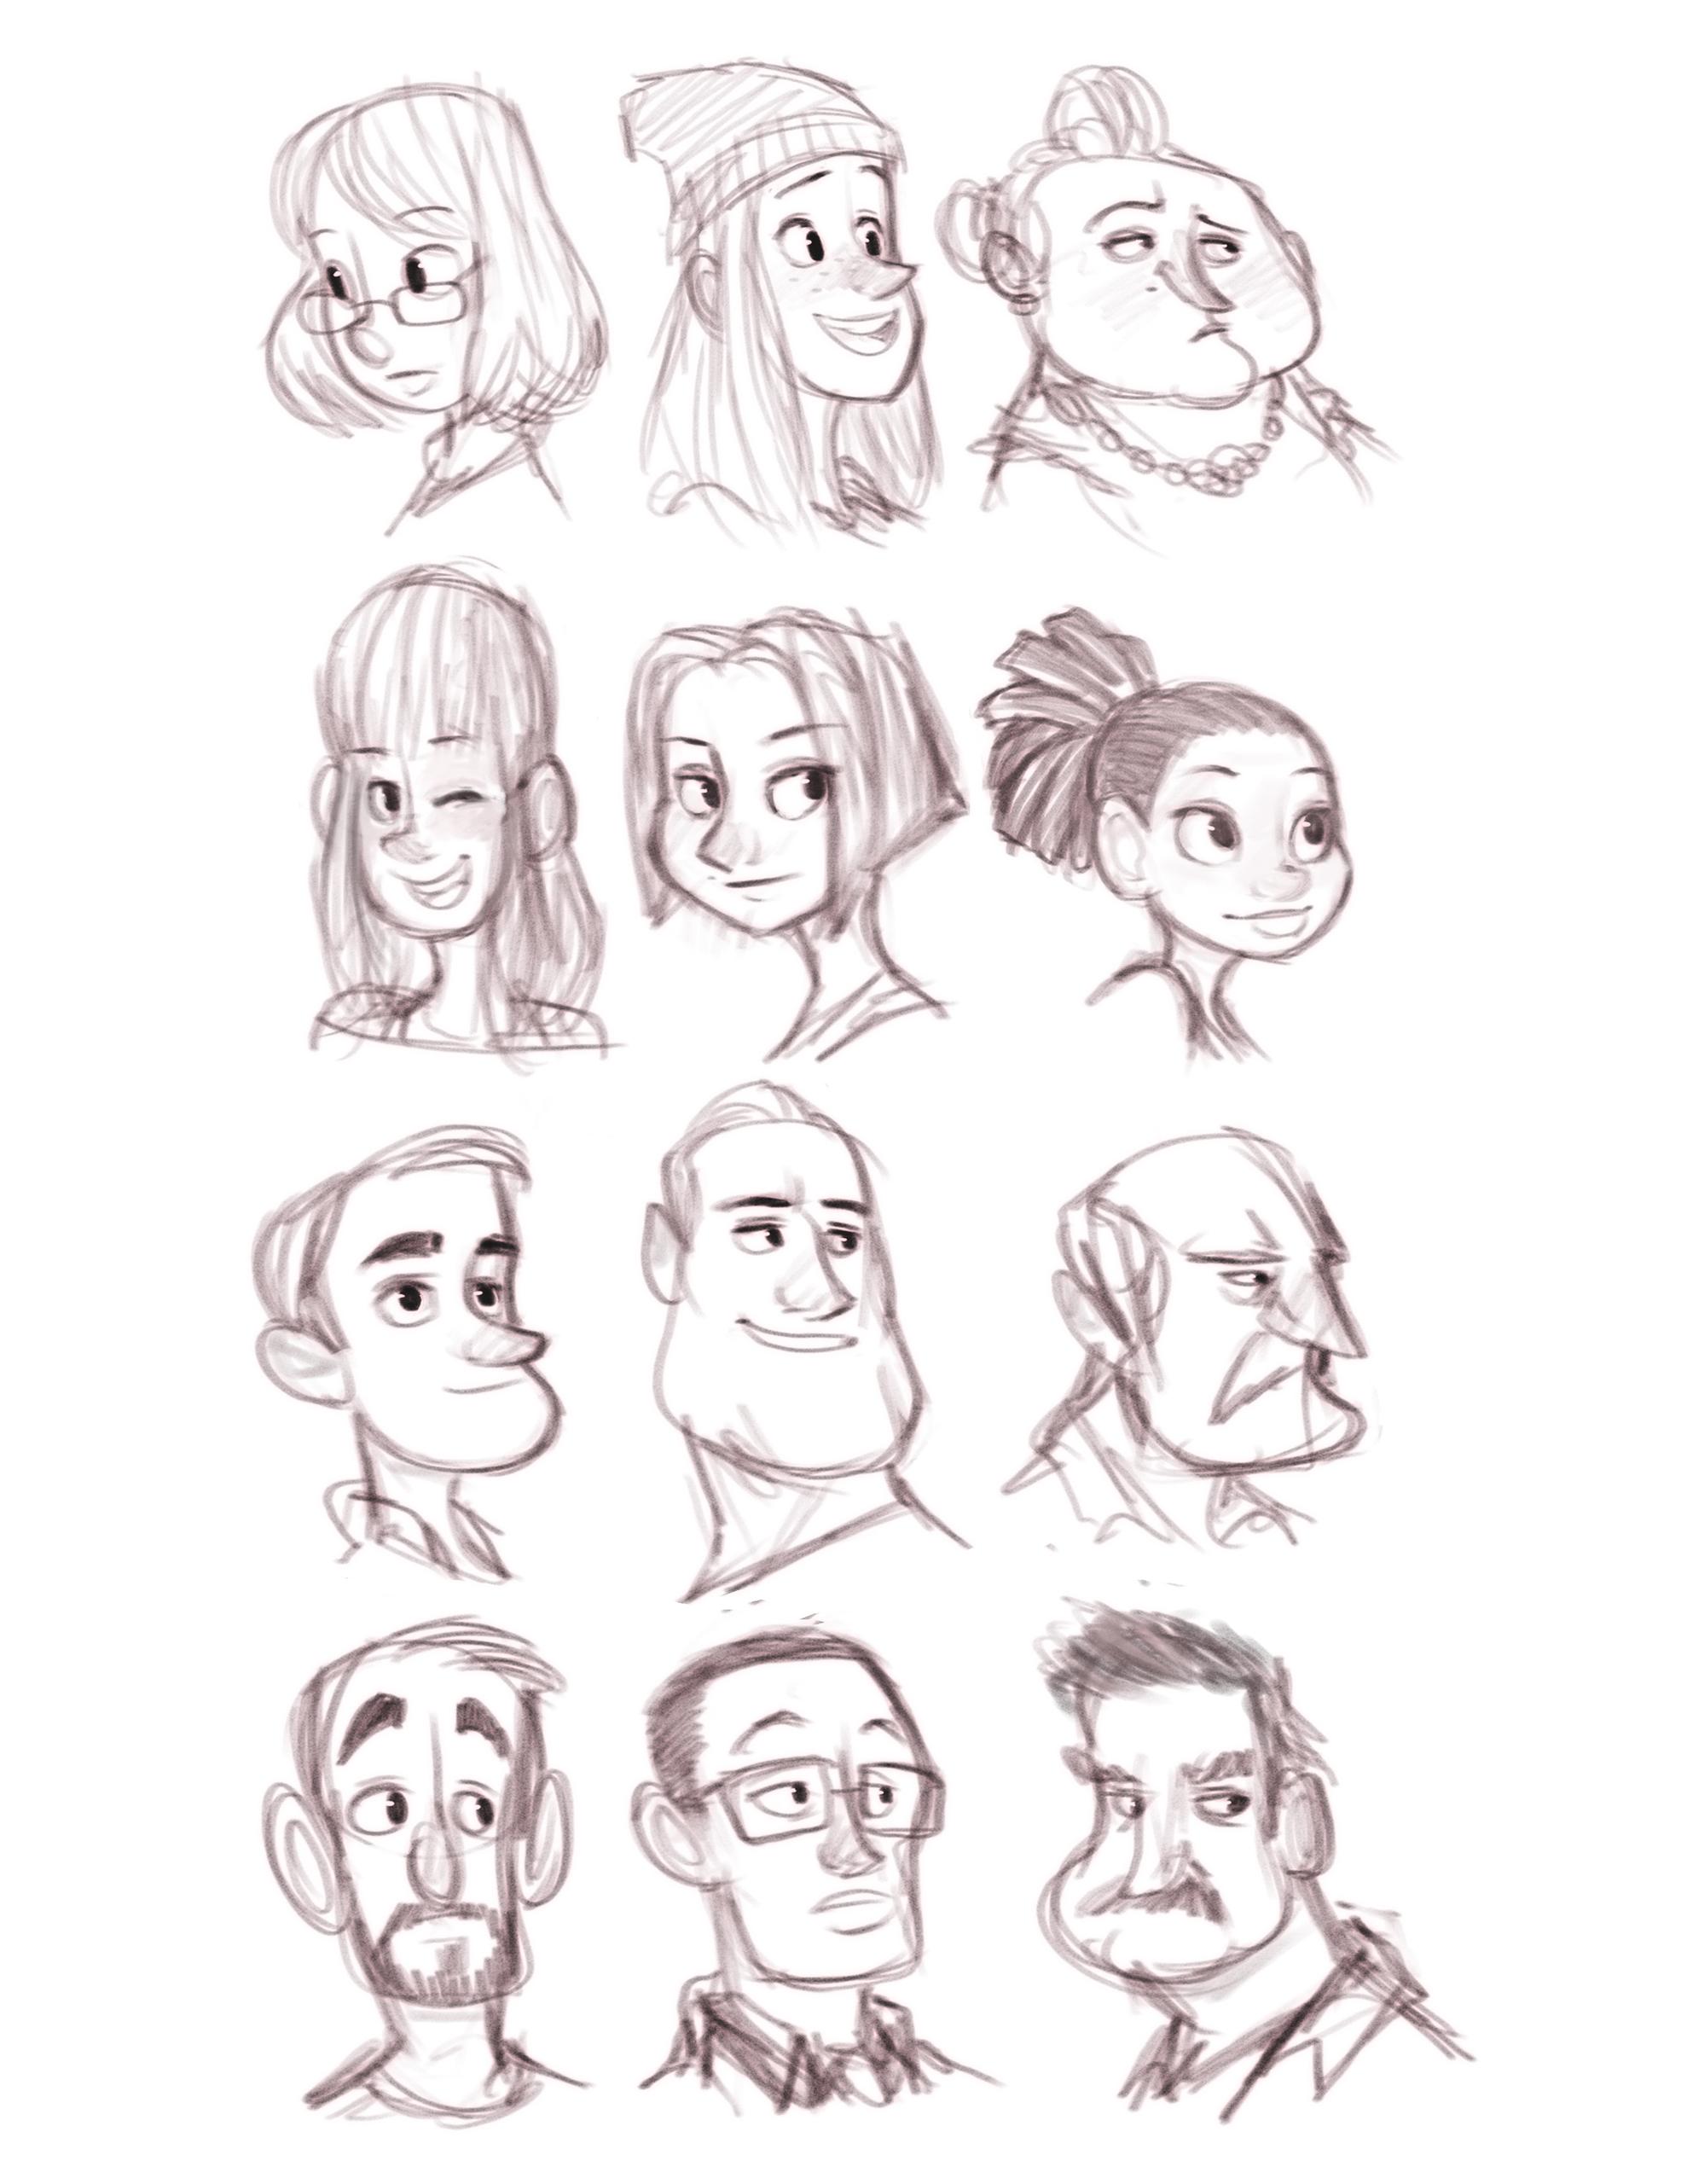 Gotta sketching - luigil-2352   ello